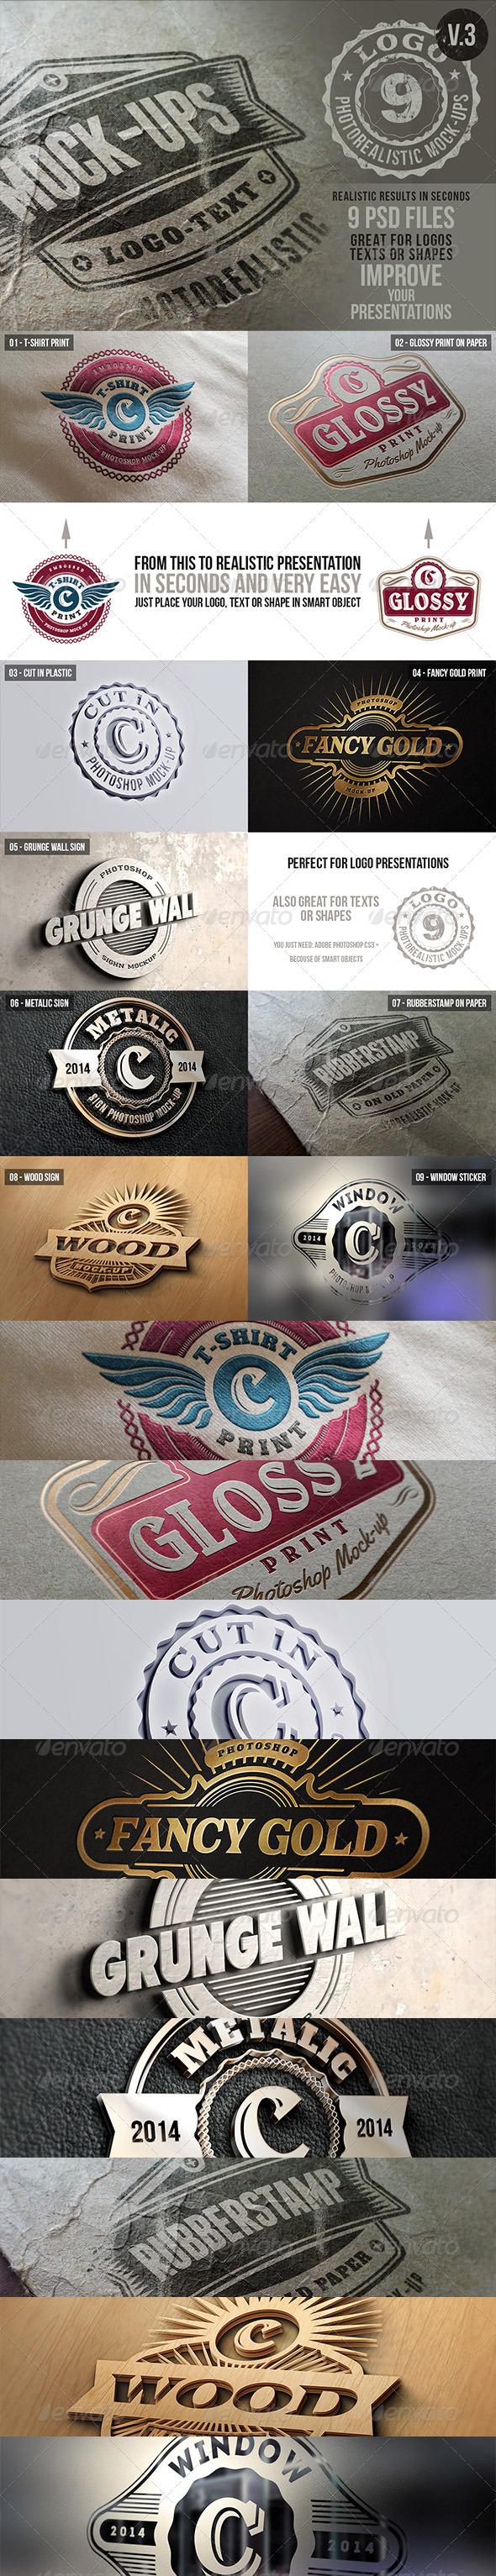 GraphicRiver Photorealistic Logo Mock-Ups Vol.3 6367196